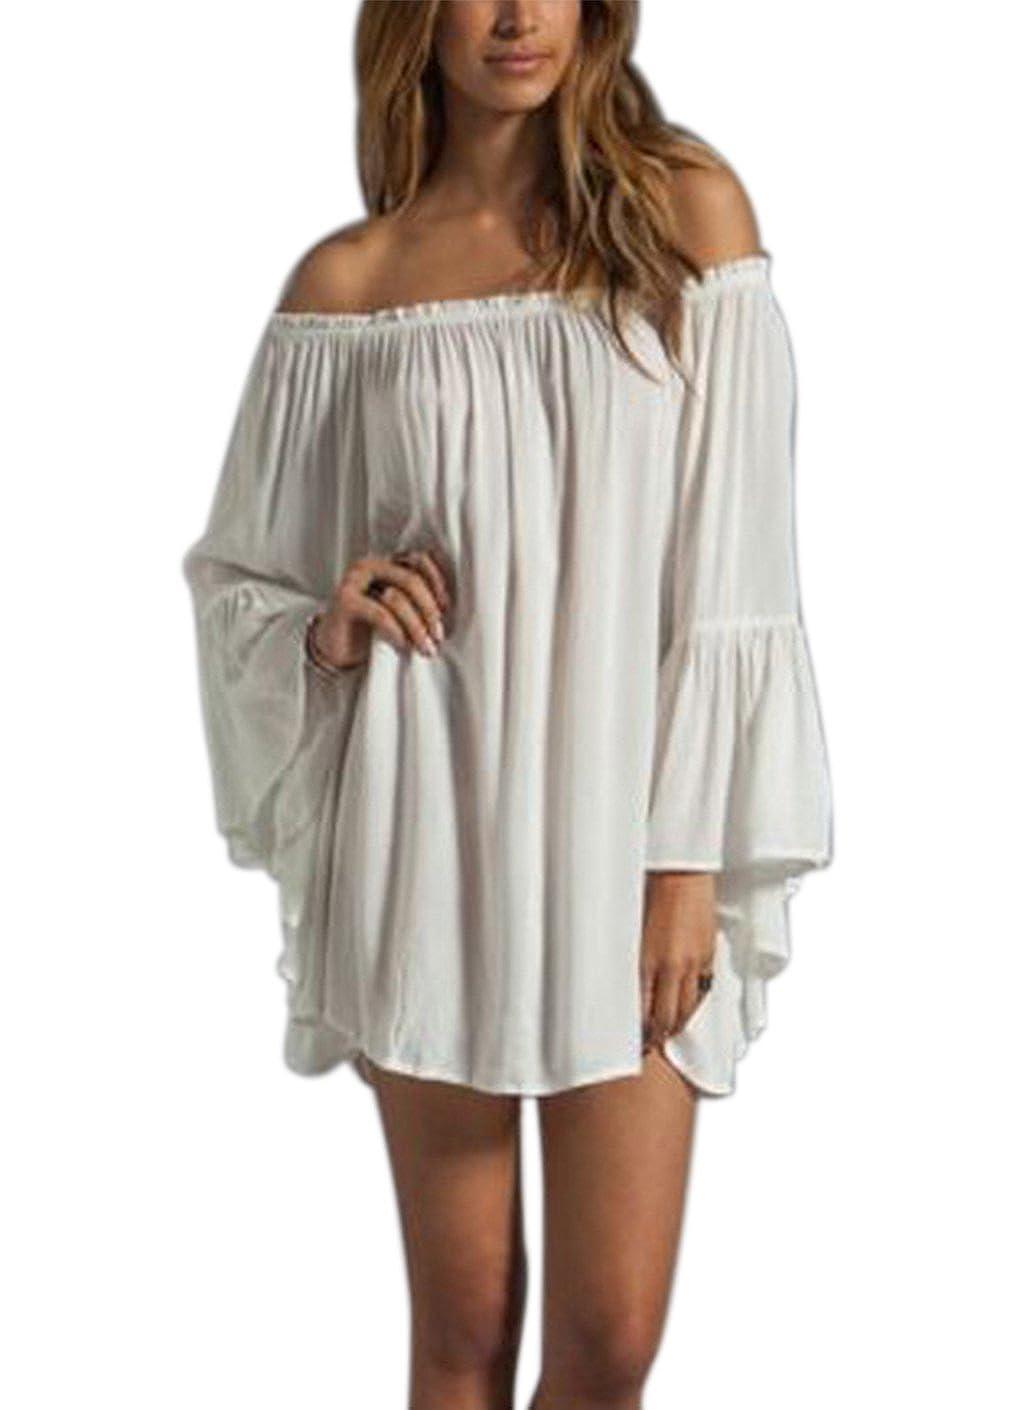 BienBien Ruffle Sleeve Tops Women Sexy Summer Casual Chiffon Long Sleeve Off Shoulder Beach Mini Dress